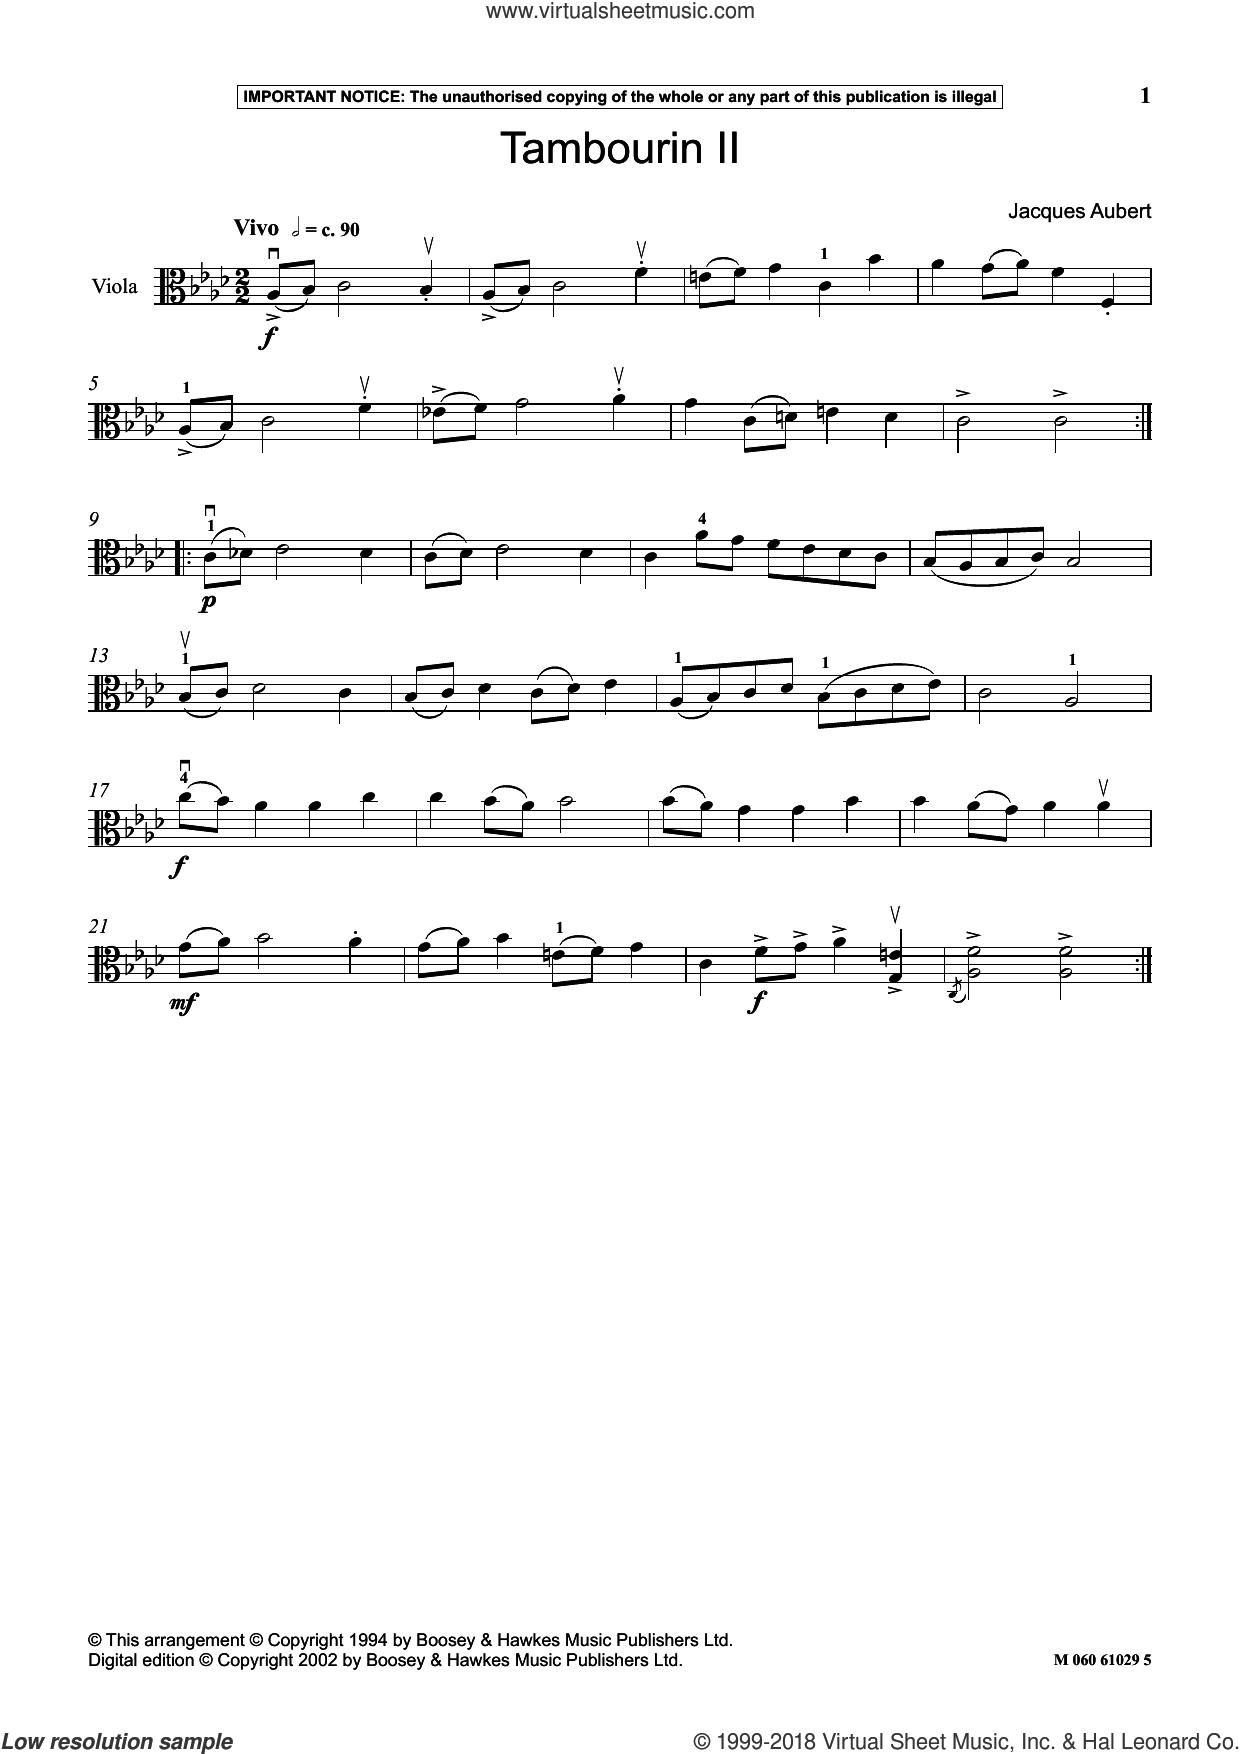 Tambourin II sheet music for viola solo by Jacques Aubert, classical score, intermediate skill level